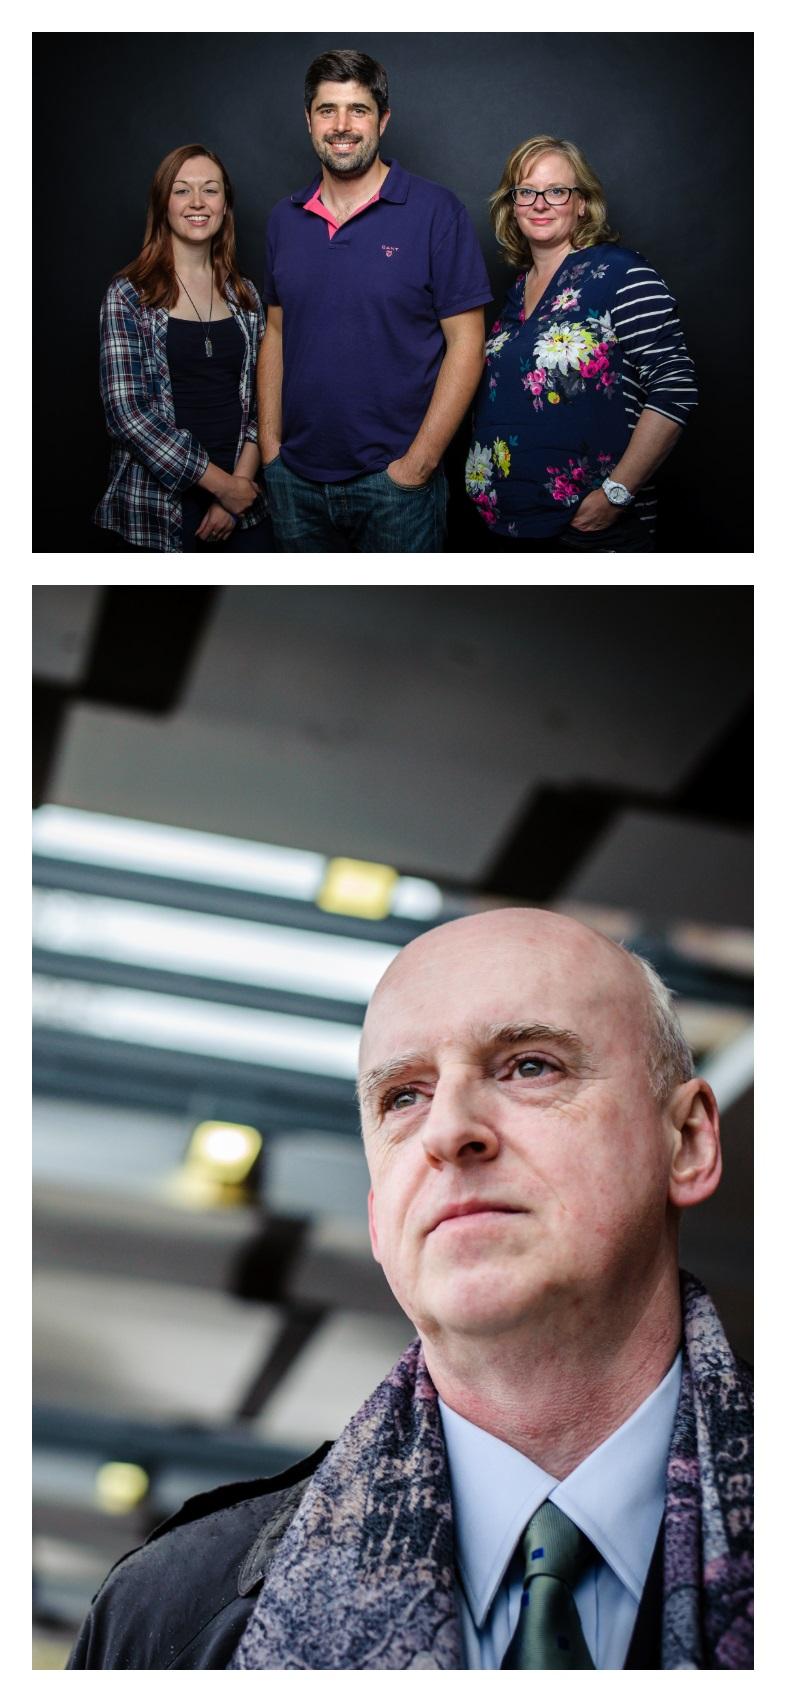 Head shots Portrait photography Birmingham Midlands Warwickshire UK by Chris Fossey 13